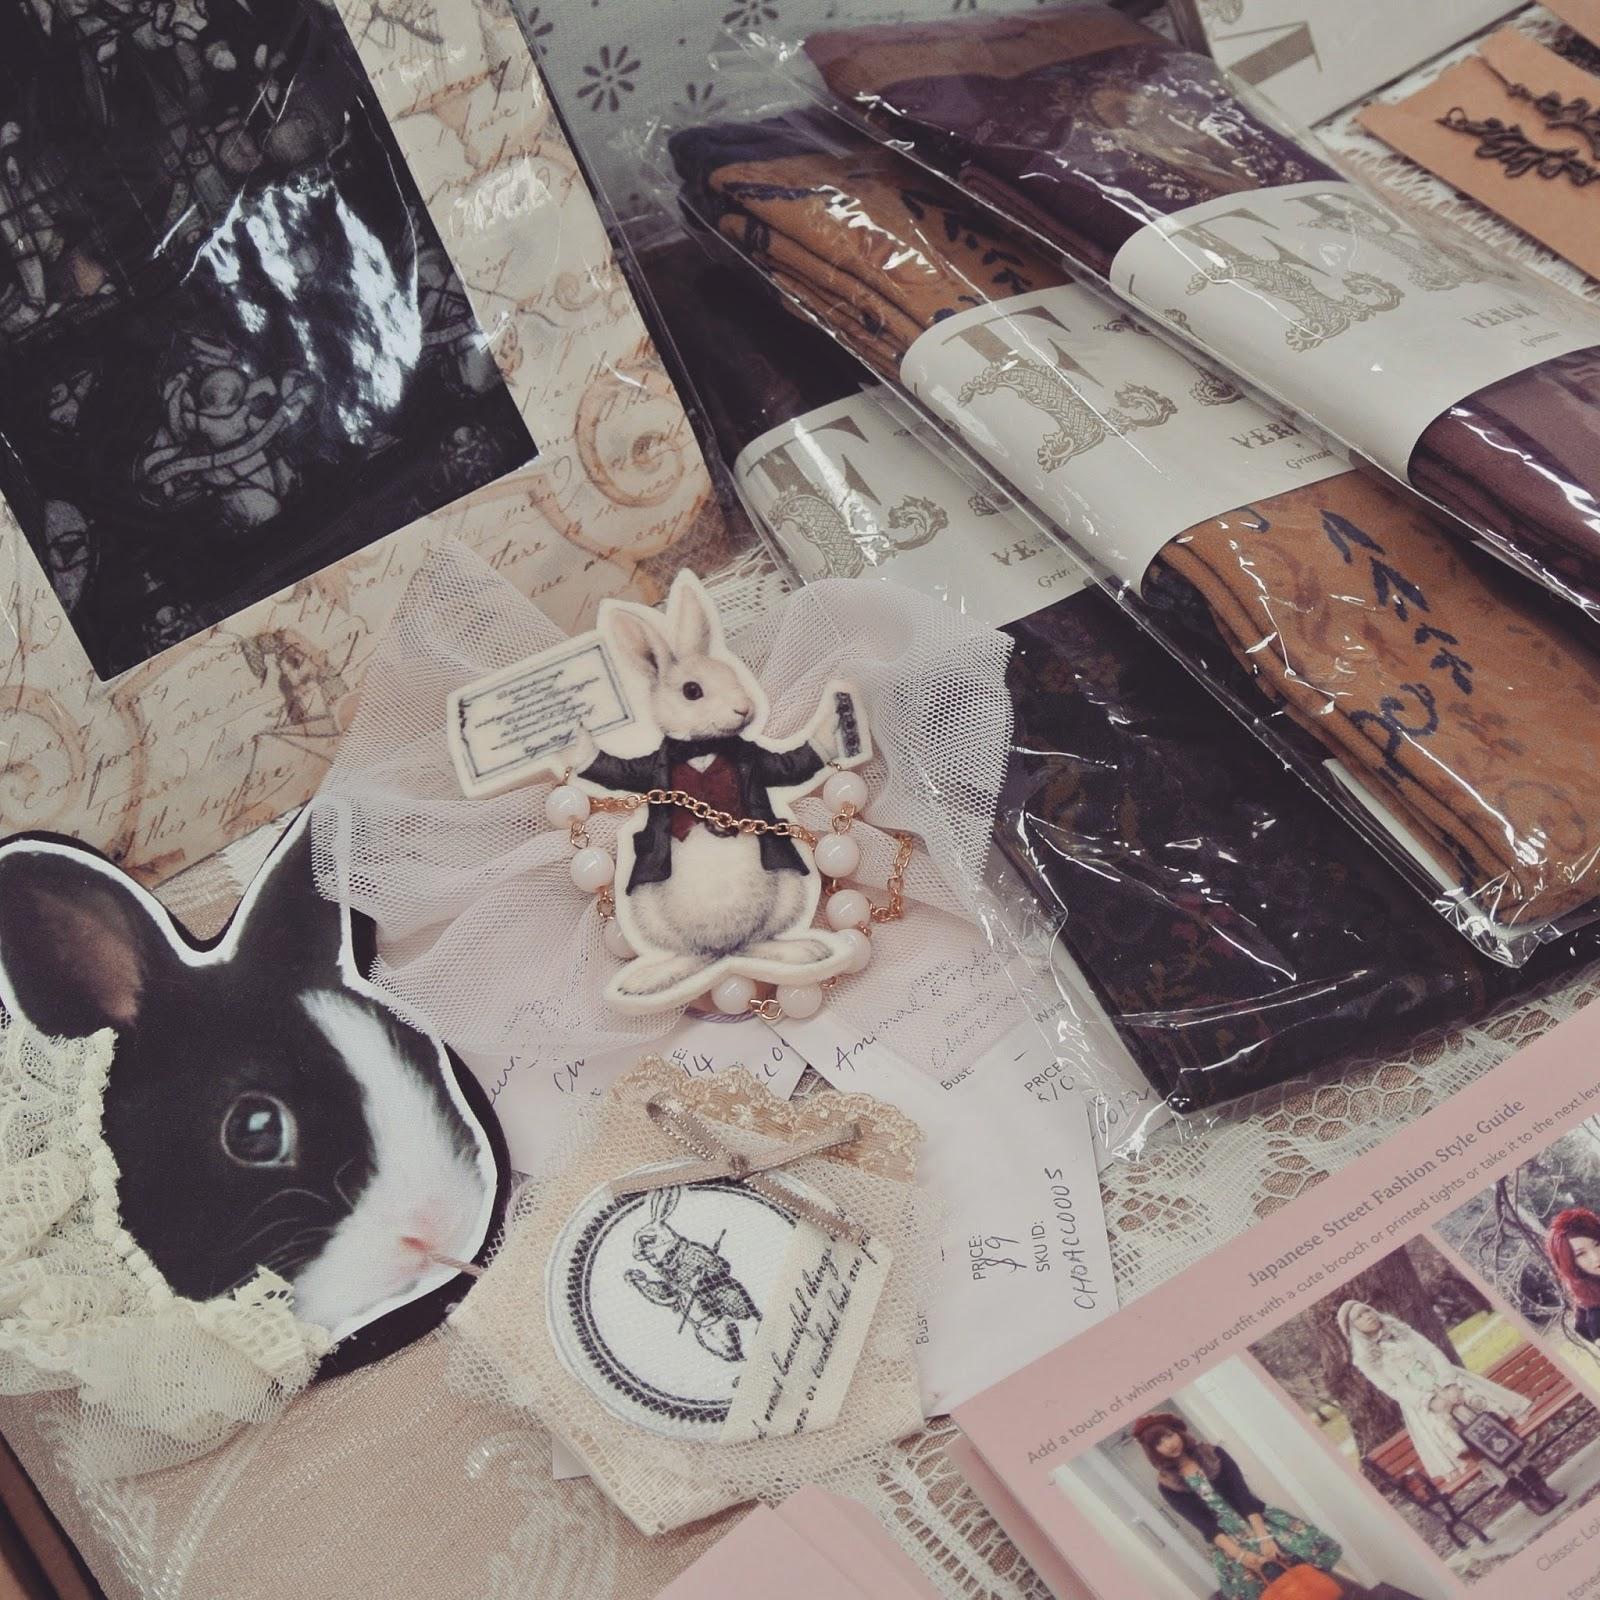 grimoire verum chiffon rose shop kawaii fashion cute woodland ilustration melbourne market supanova 2015